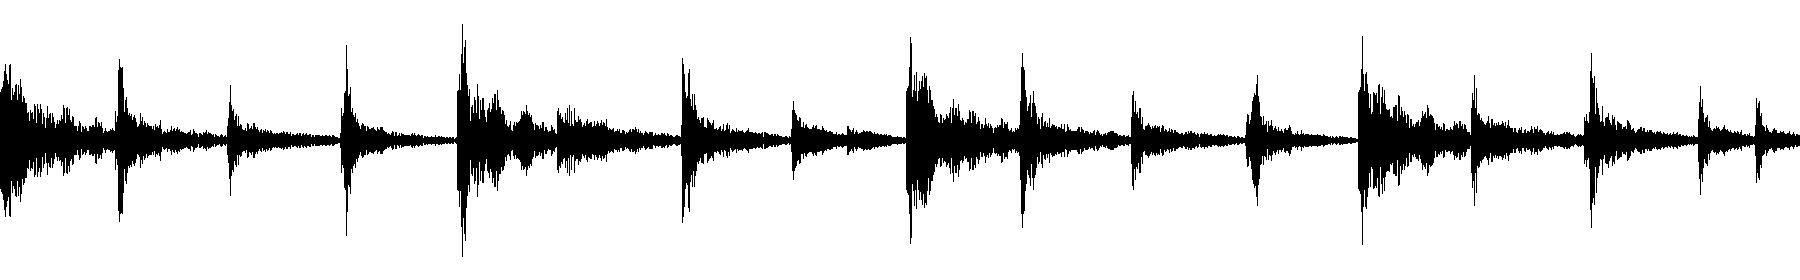 arab percussion loop 5